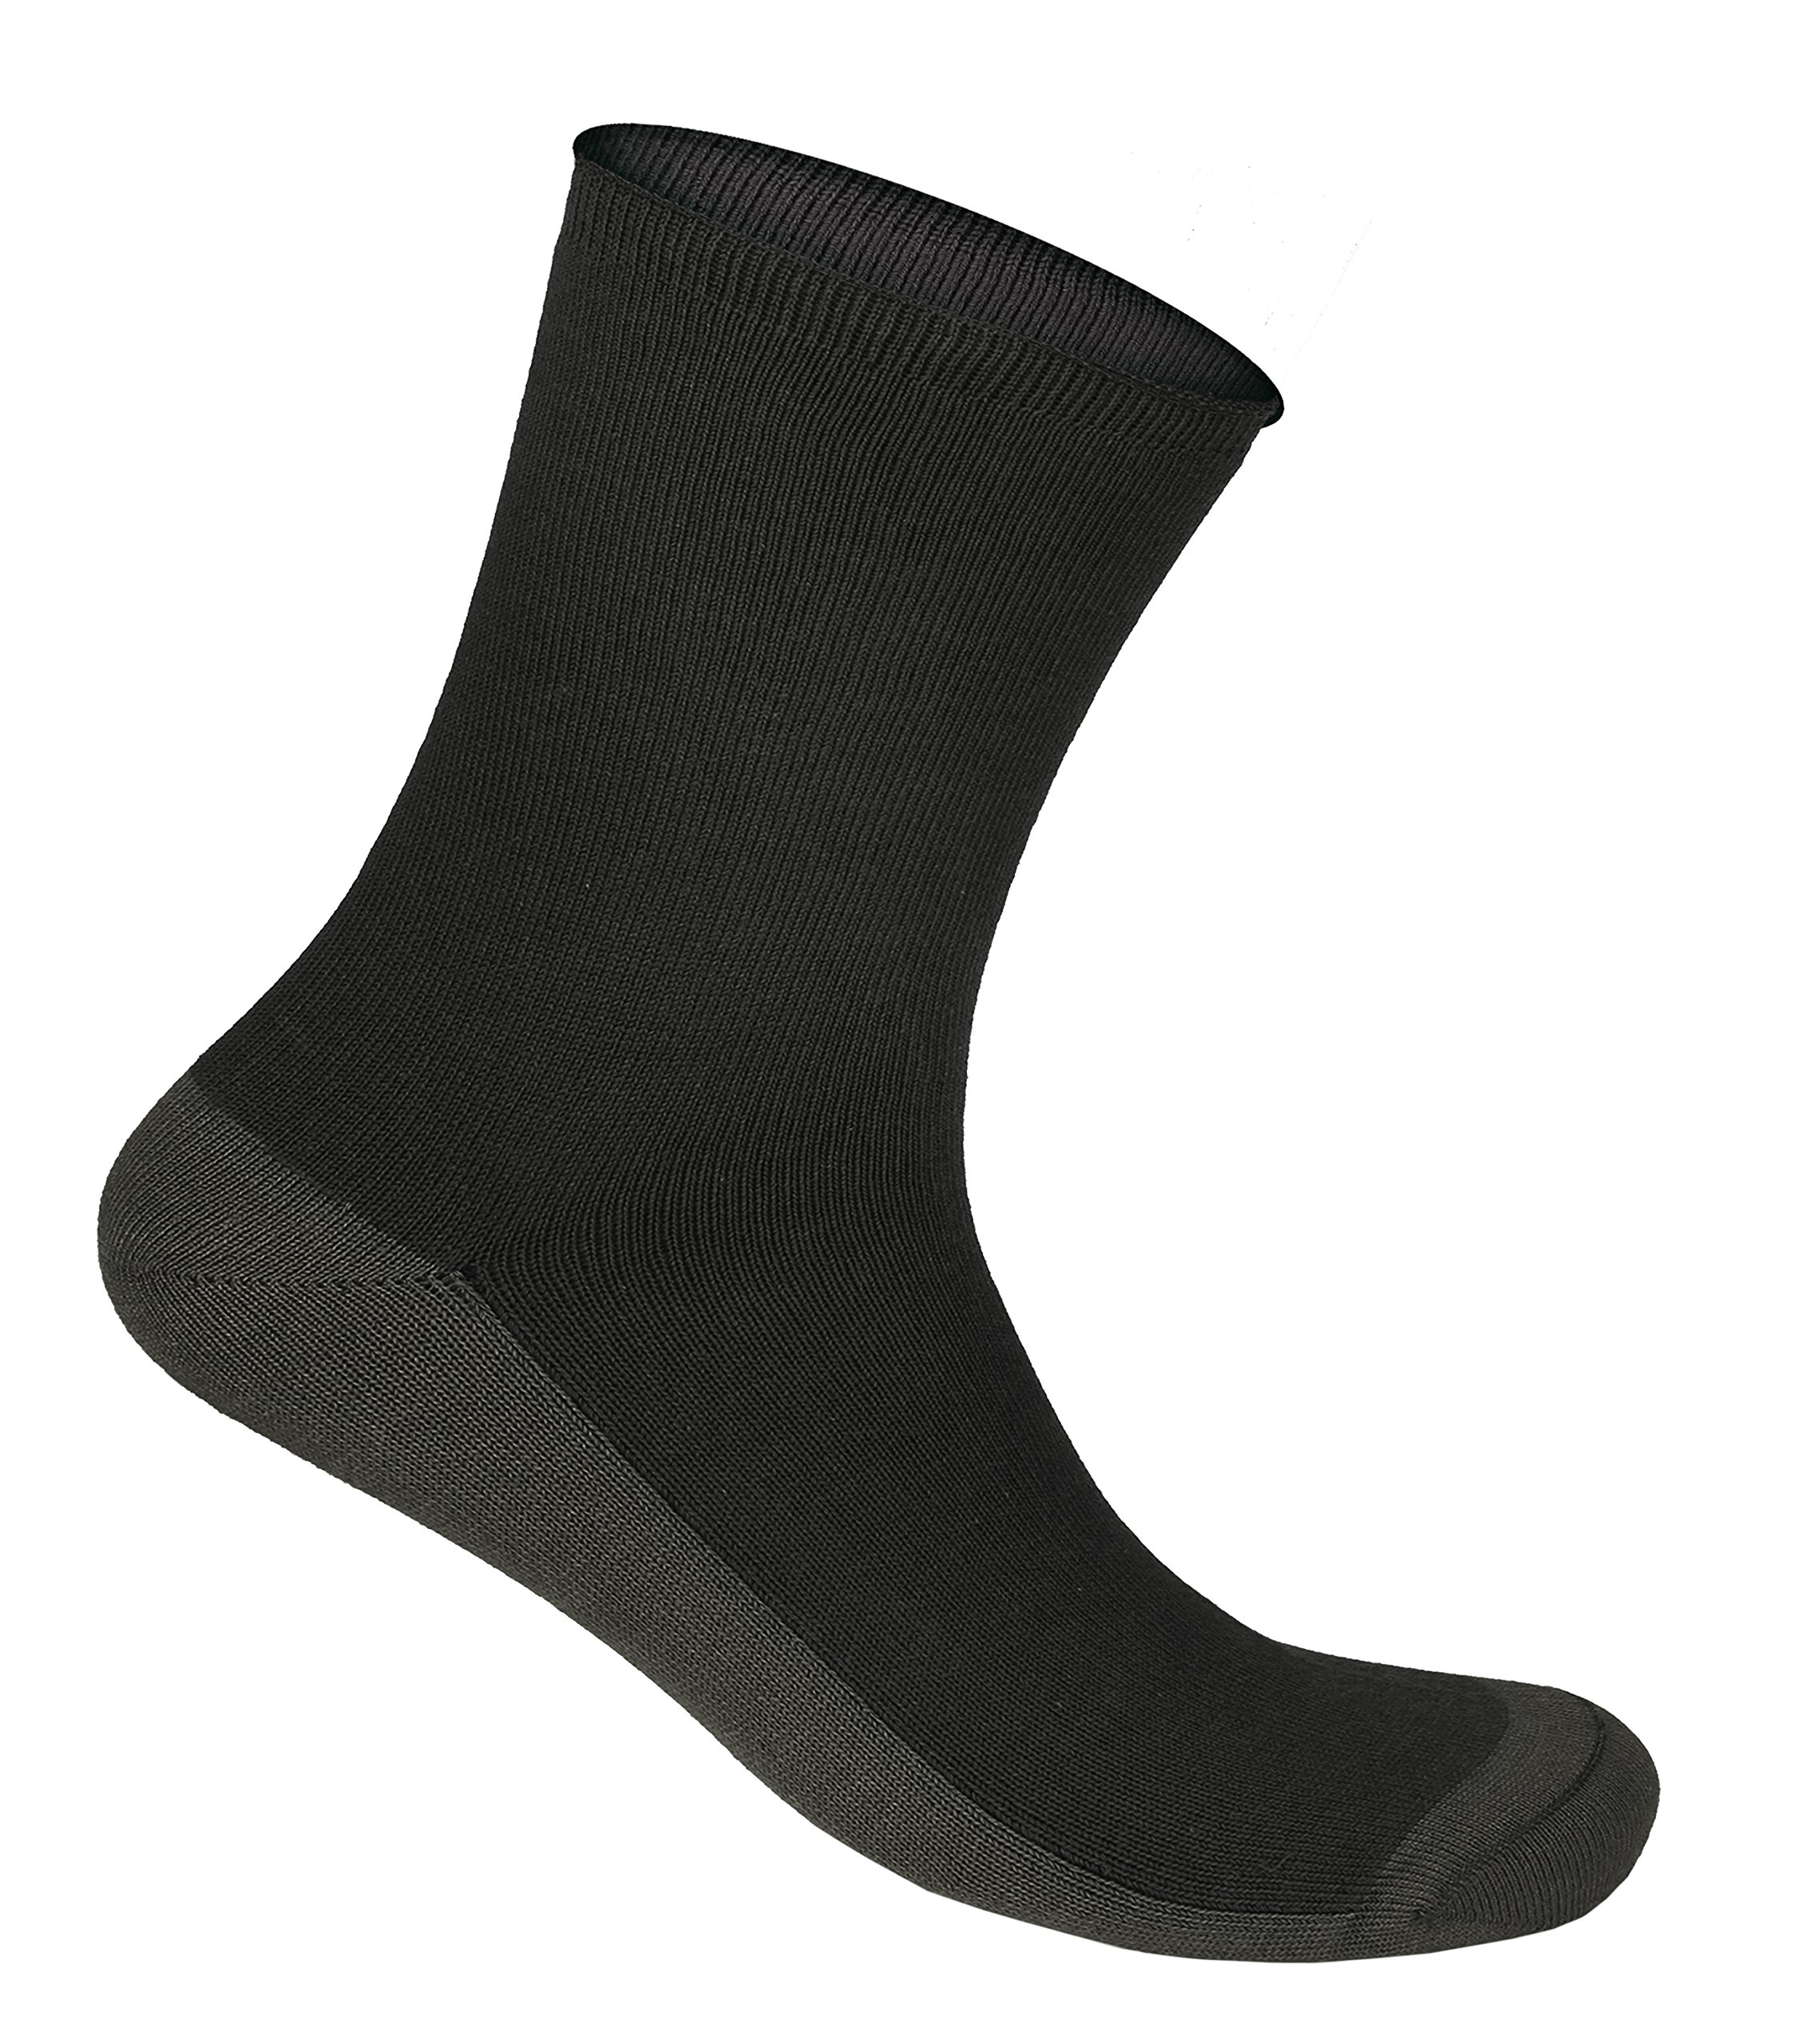 Orthofeet Casual Dress Non-Binding Non-Constrictive Circulation Seam Free Bamboo Socks Charcoal, 3 Pack Medium